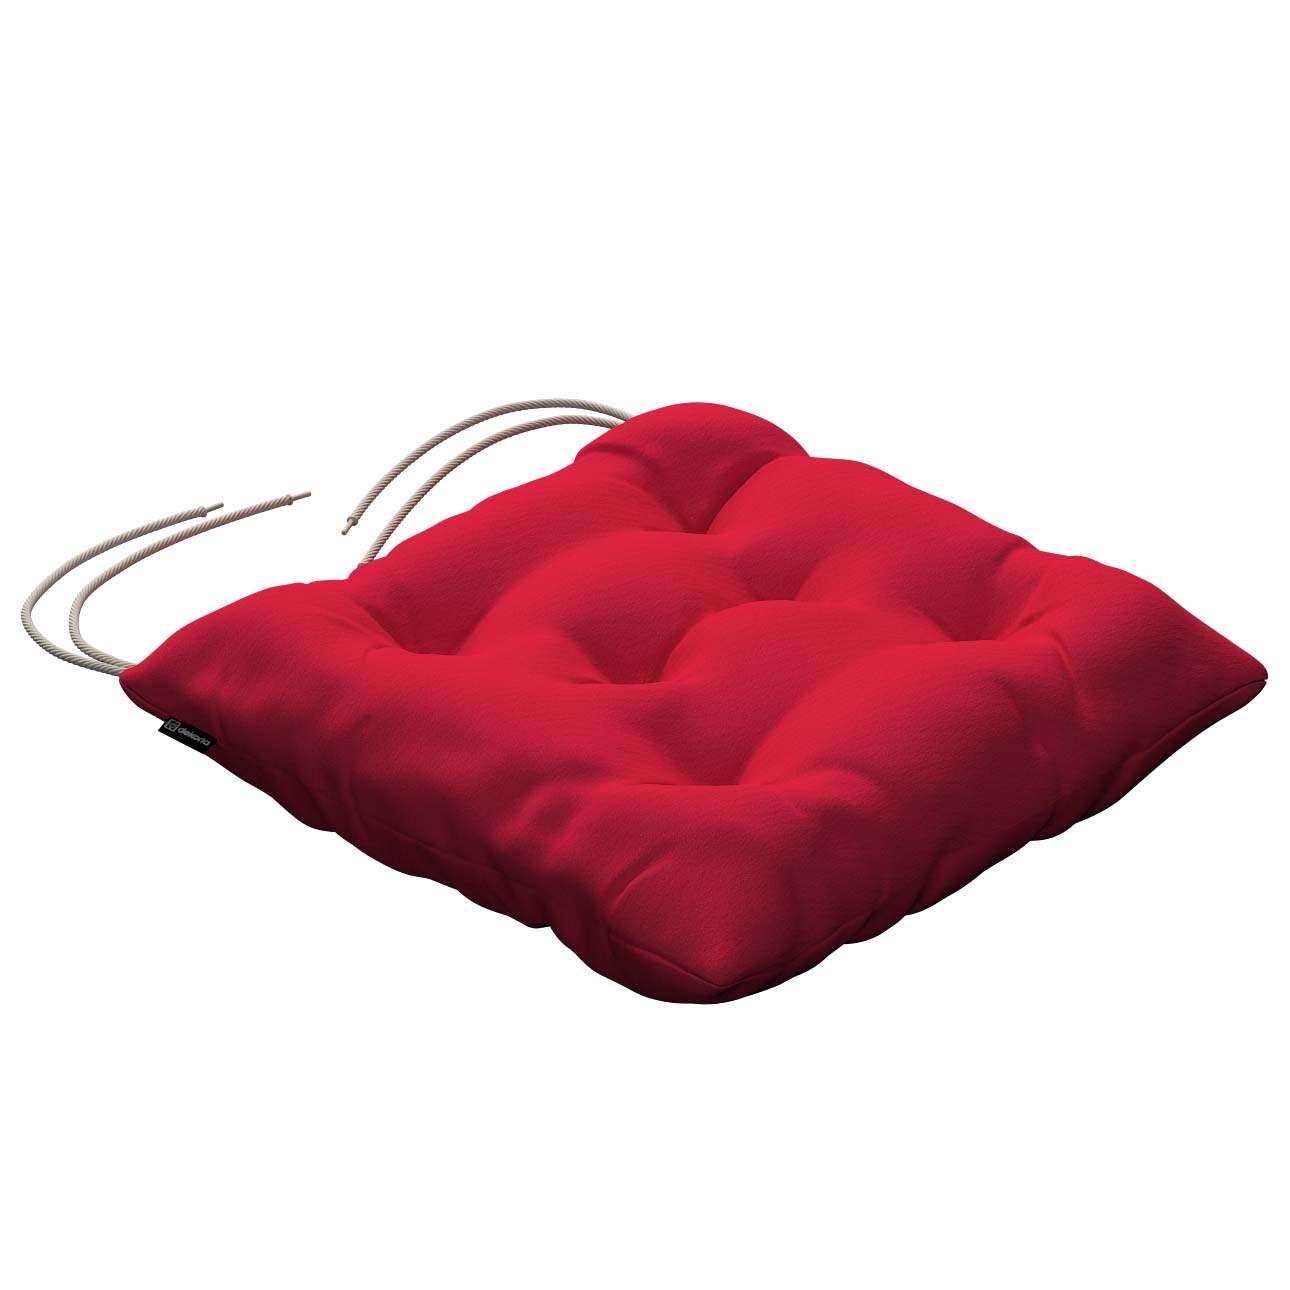 Kėdės pagalvėlė Jacek  40 x 40 x 8 cm kolekcijoje Quadro, audinys: 136-19